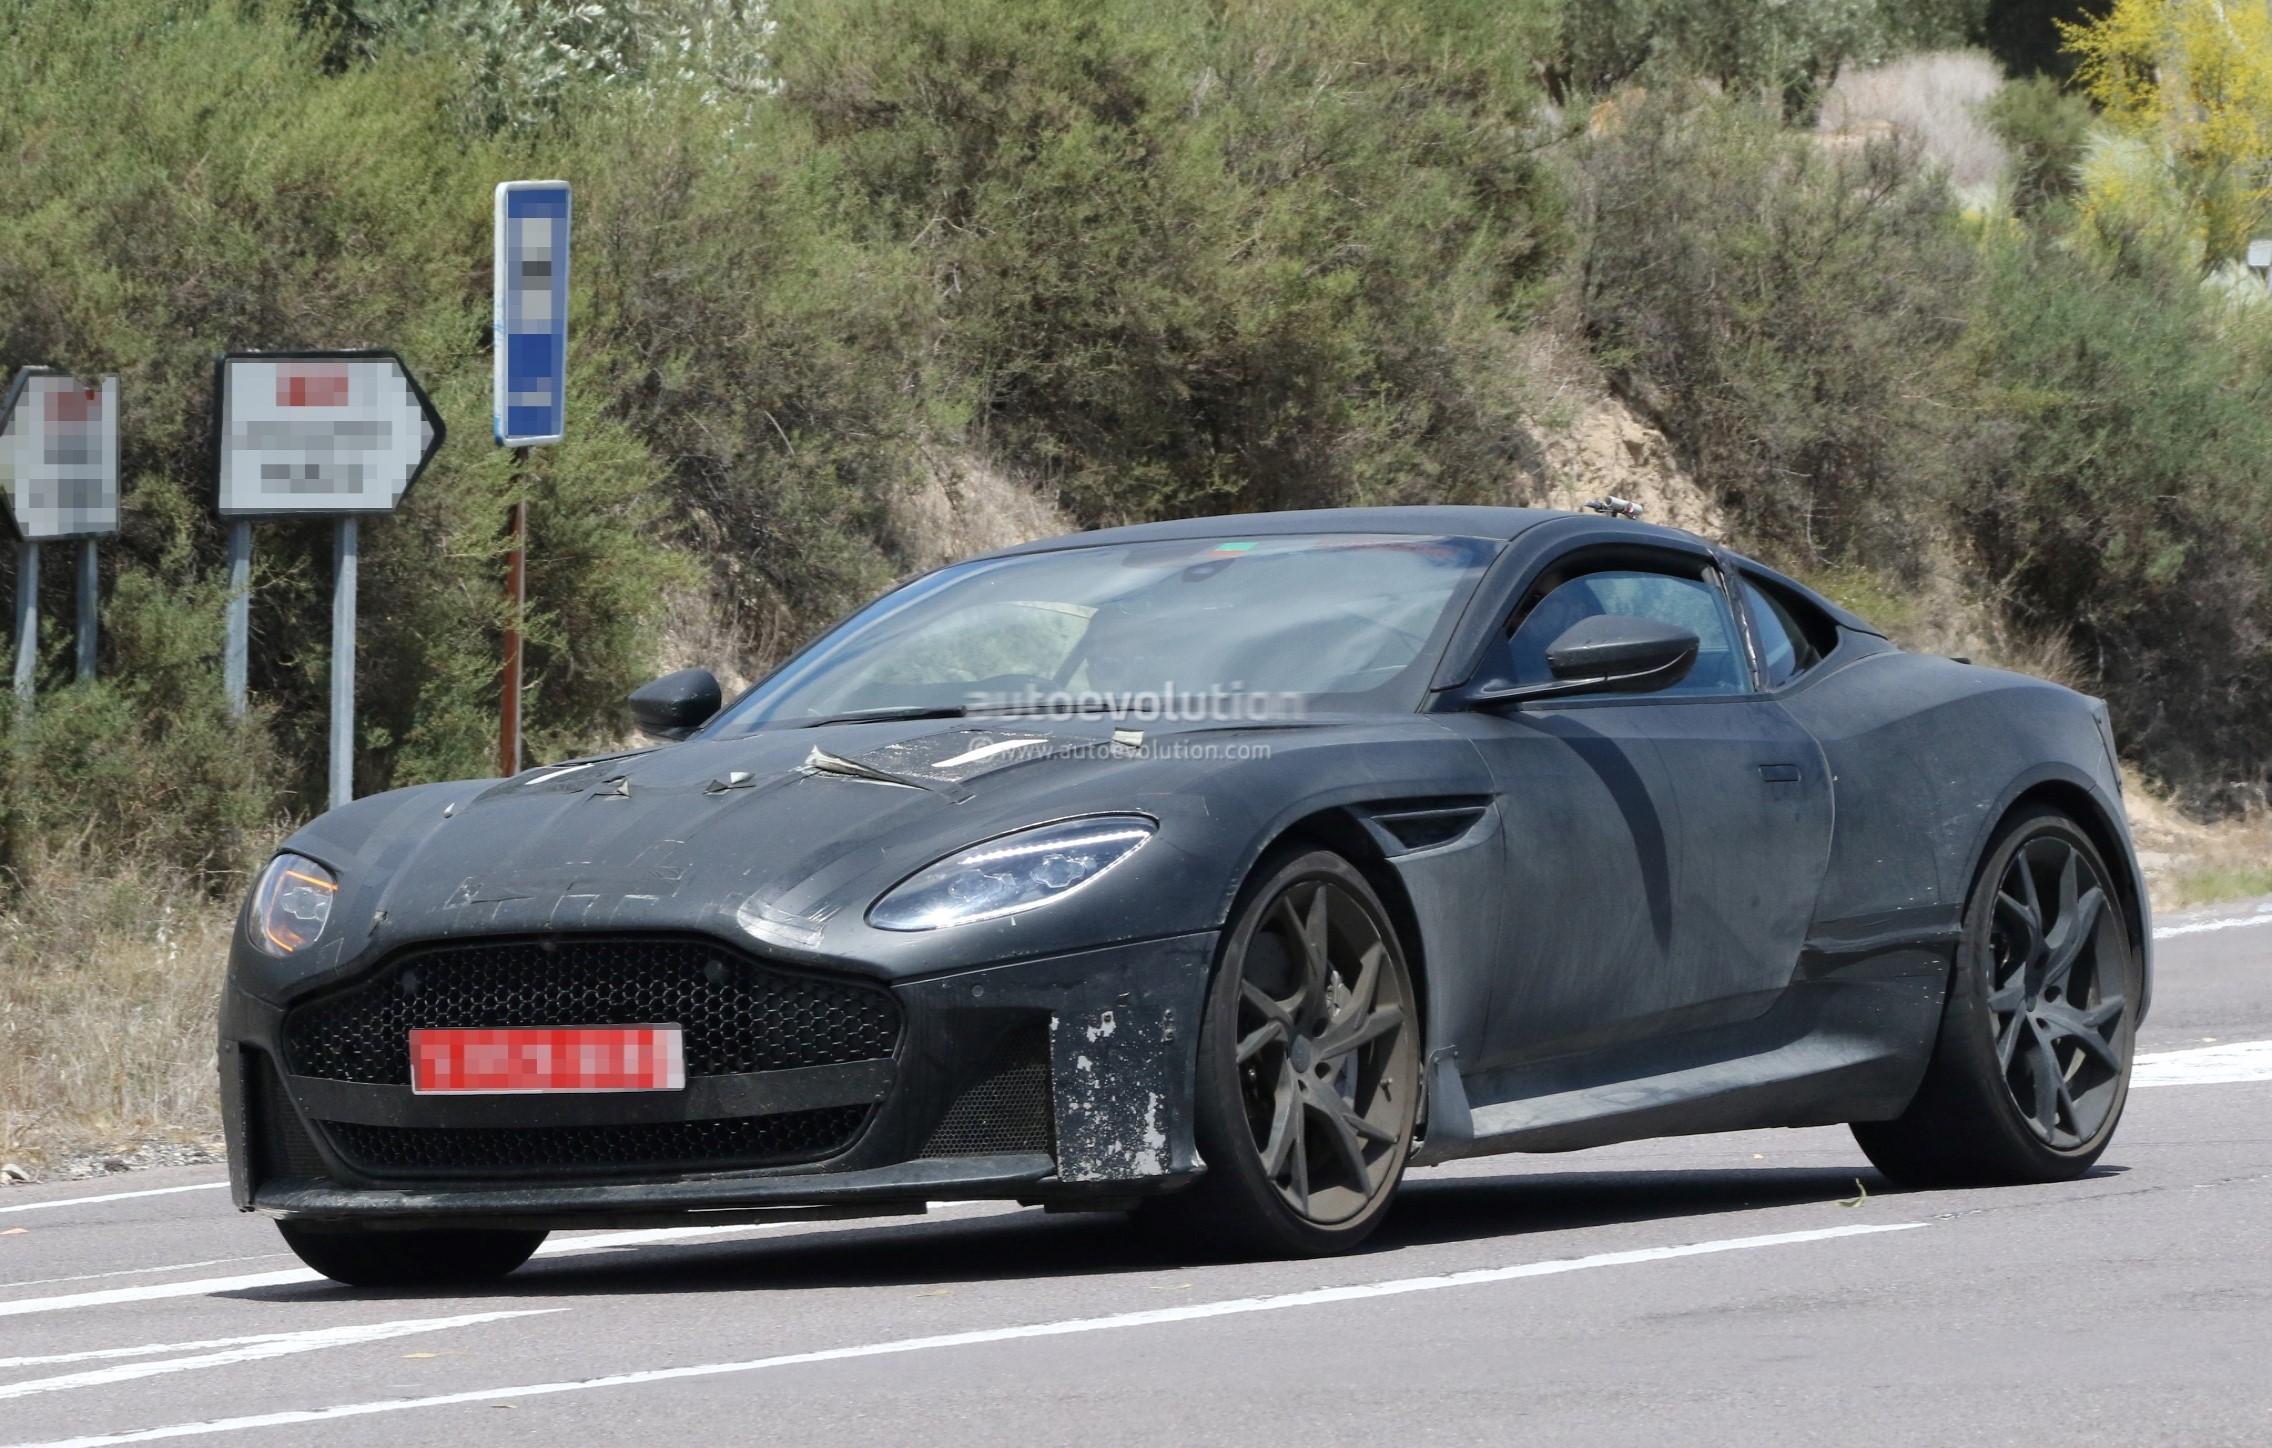 Aston Martin Dbs Superleggera Spies